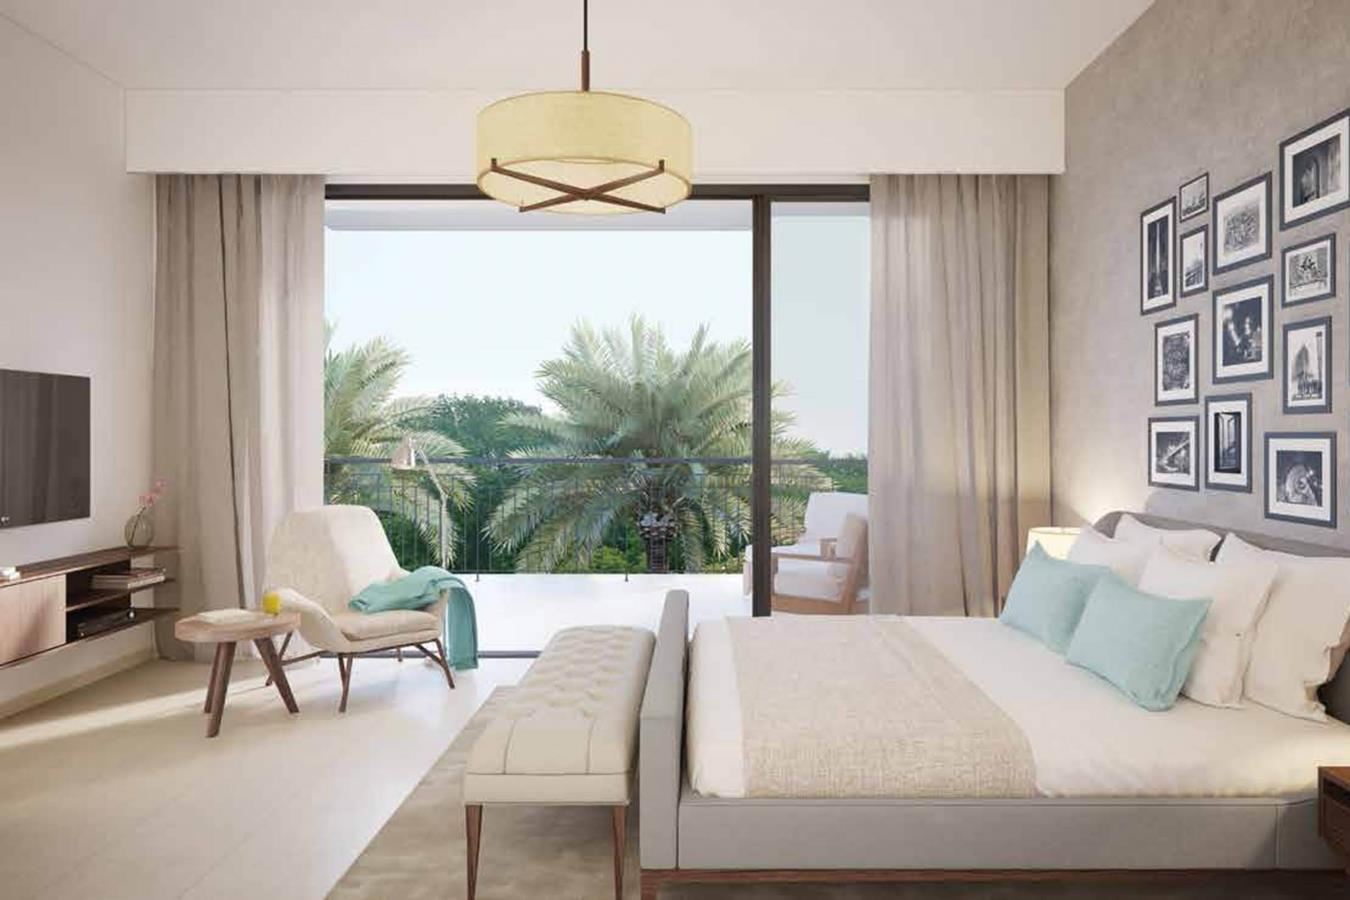 3 Bedroom Sidra 3 Large Plot 40 Percent Post Handover